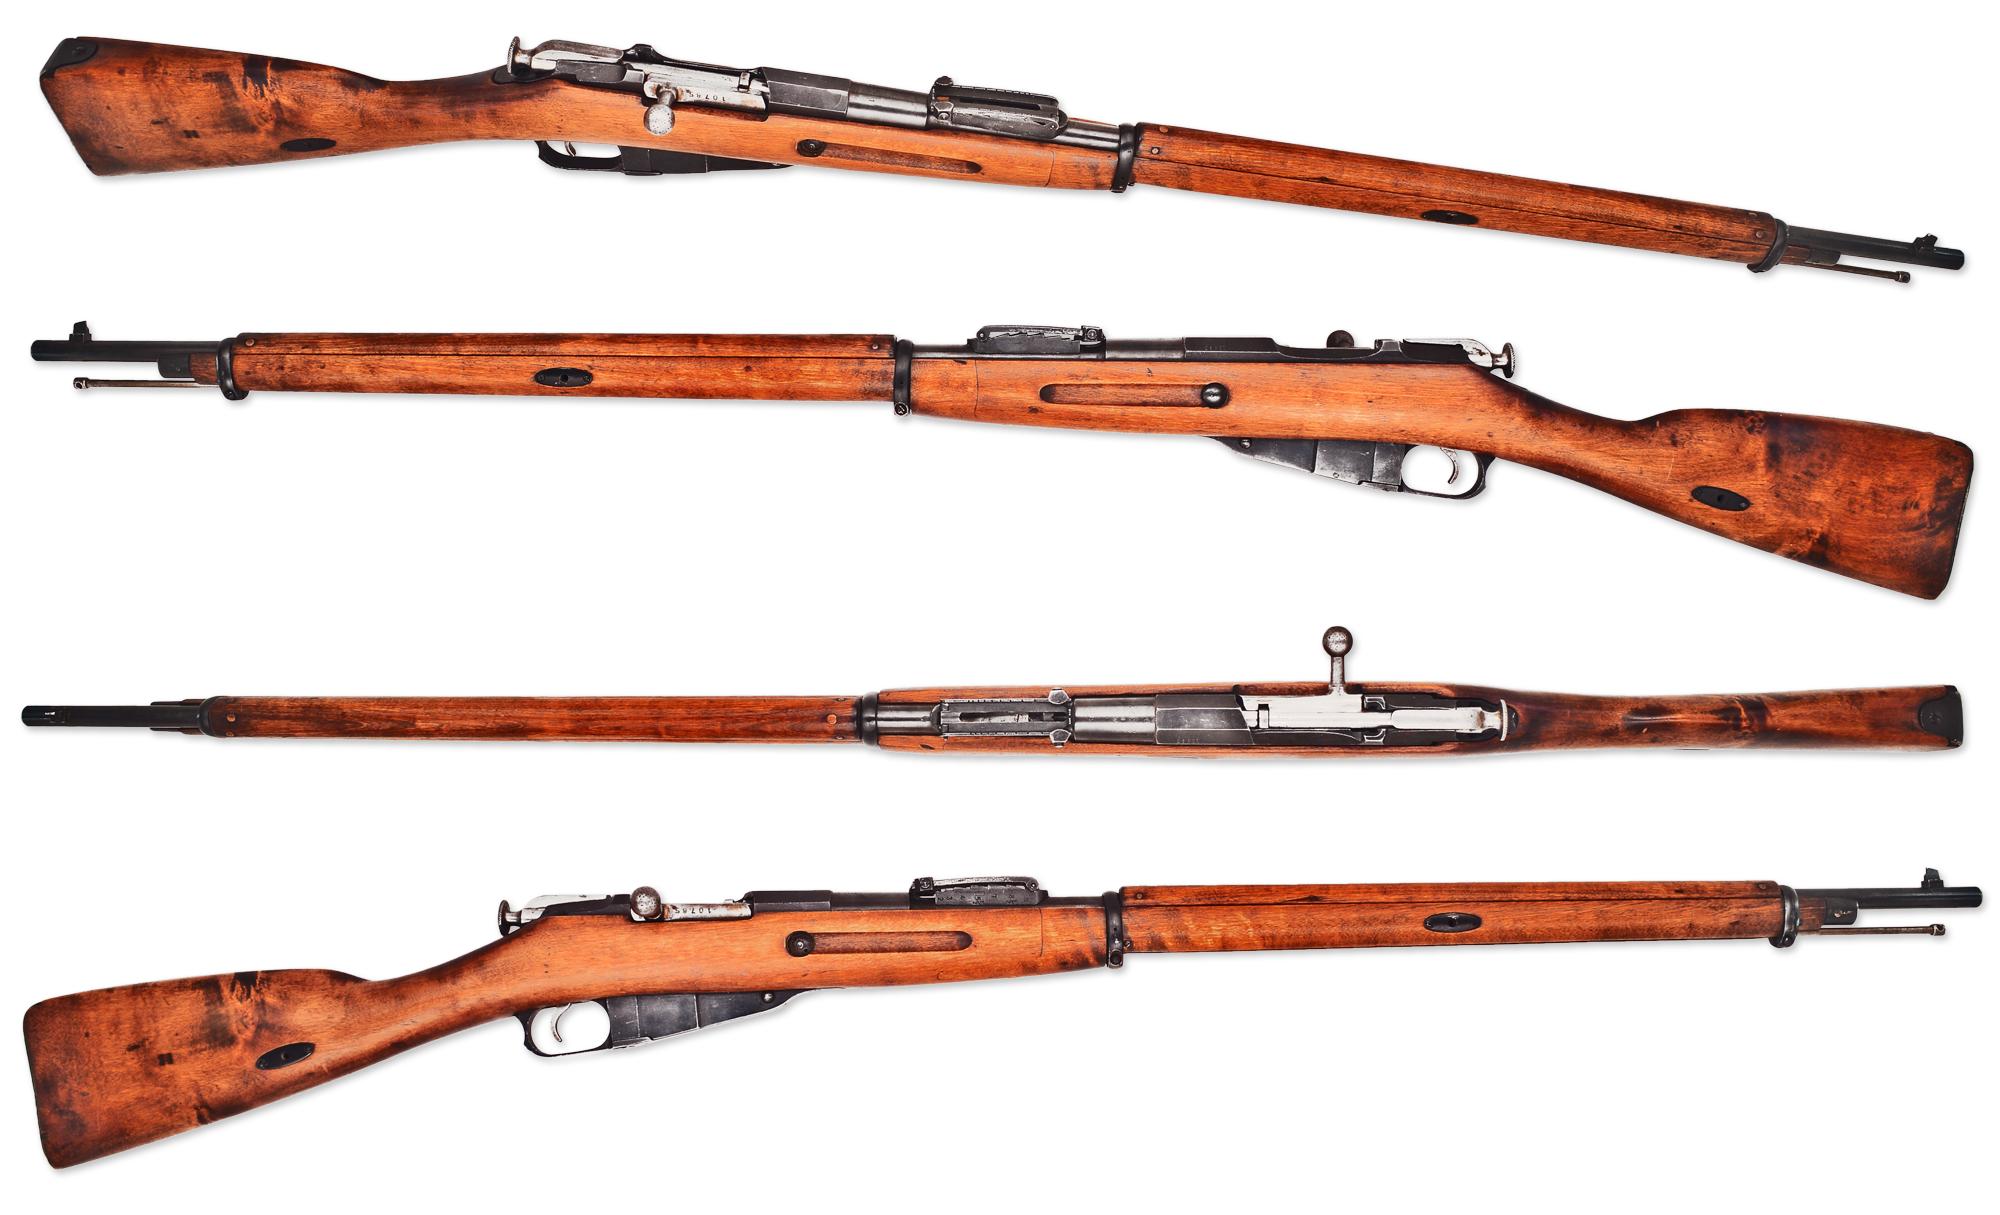 Pin On Weapons Of The Peshmerga 1975 2003 Pt2